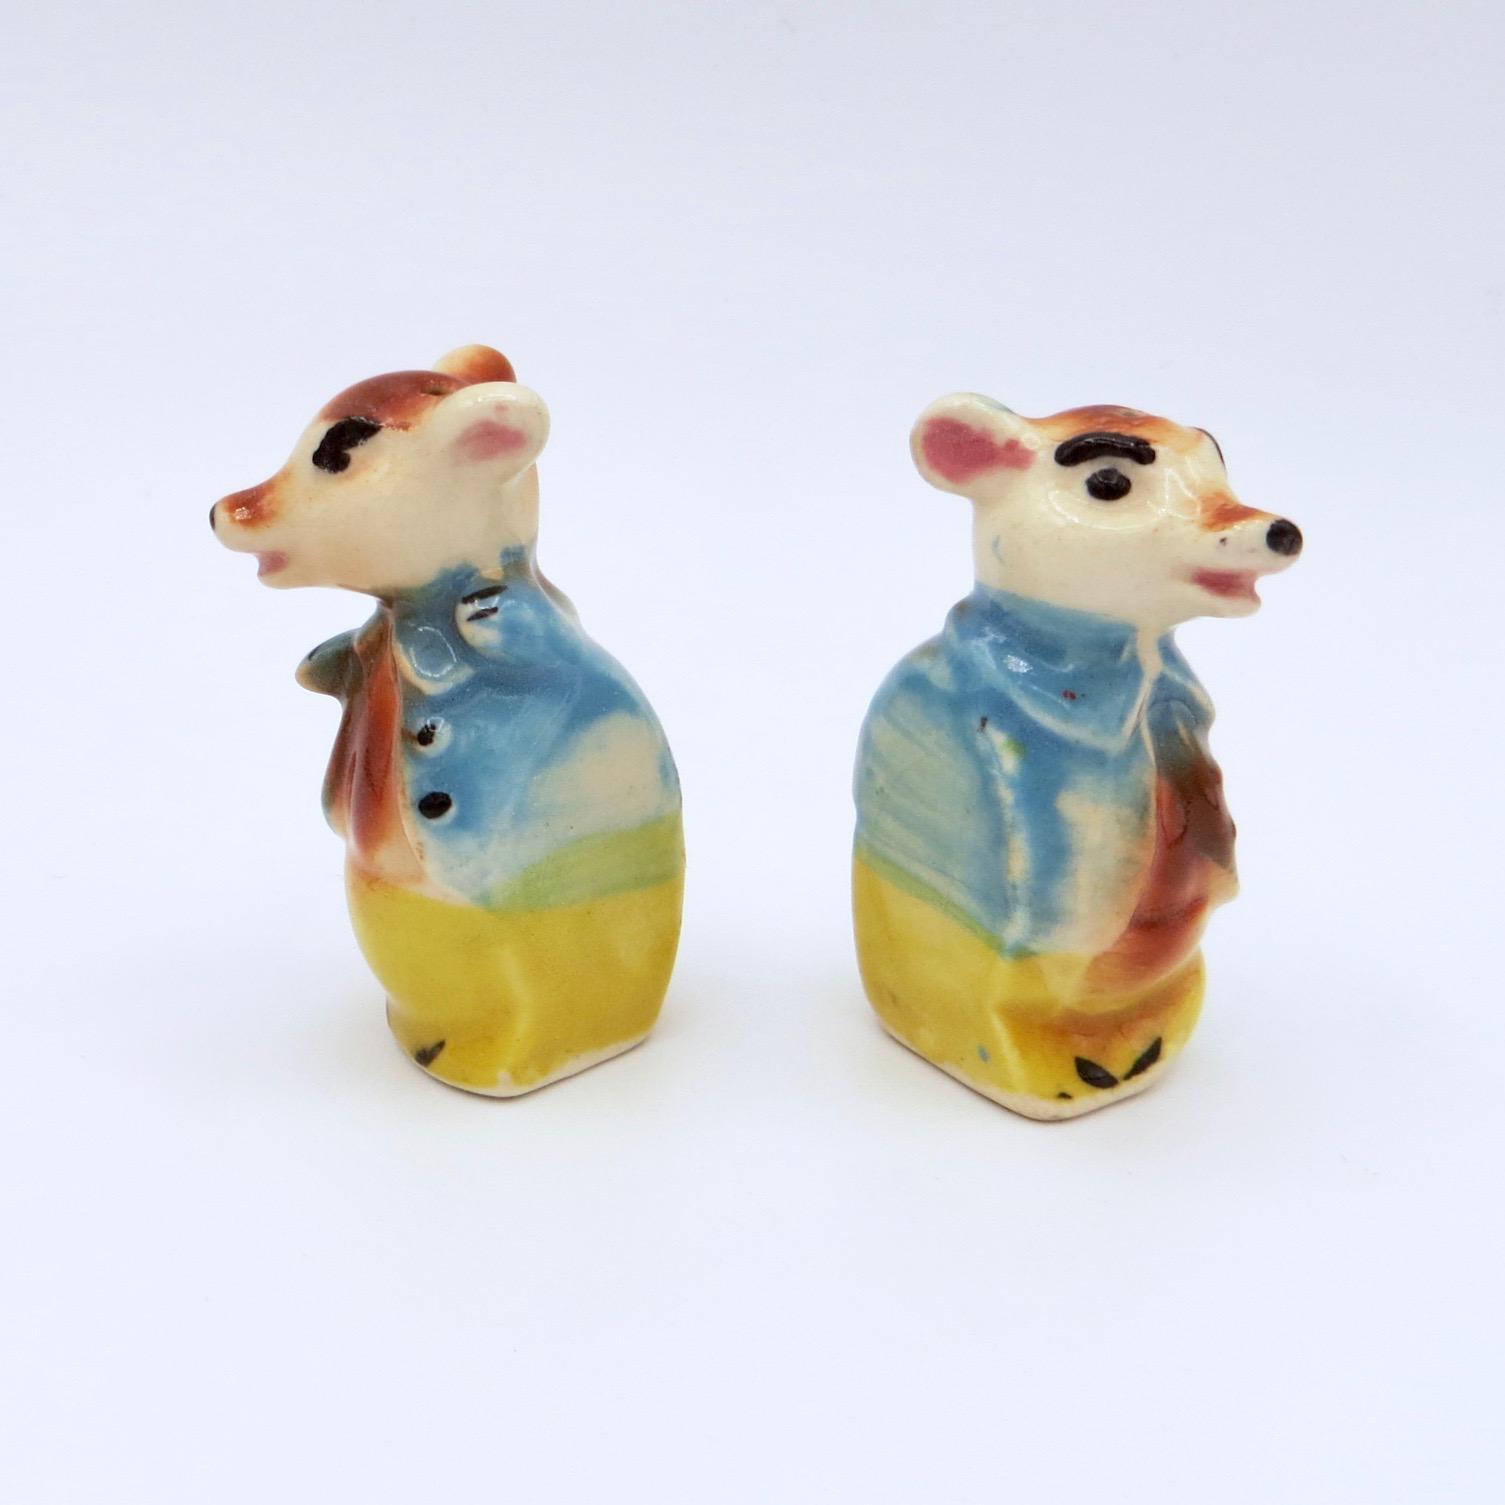 Fashionable Mice Salt & Pepper